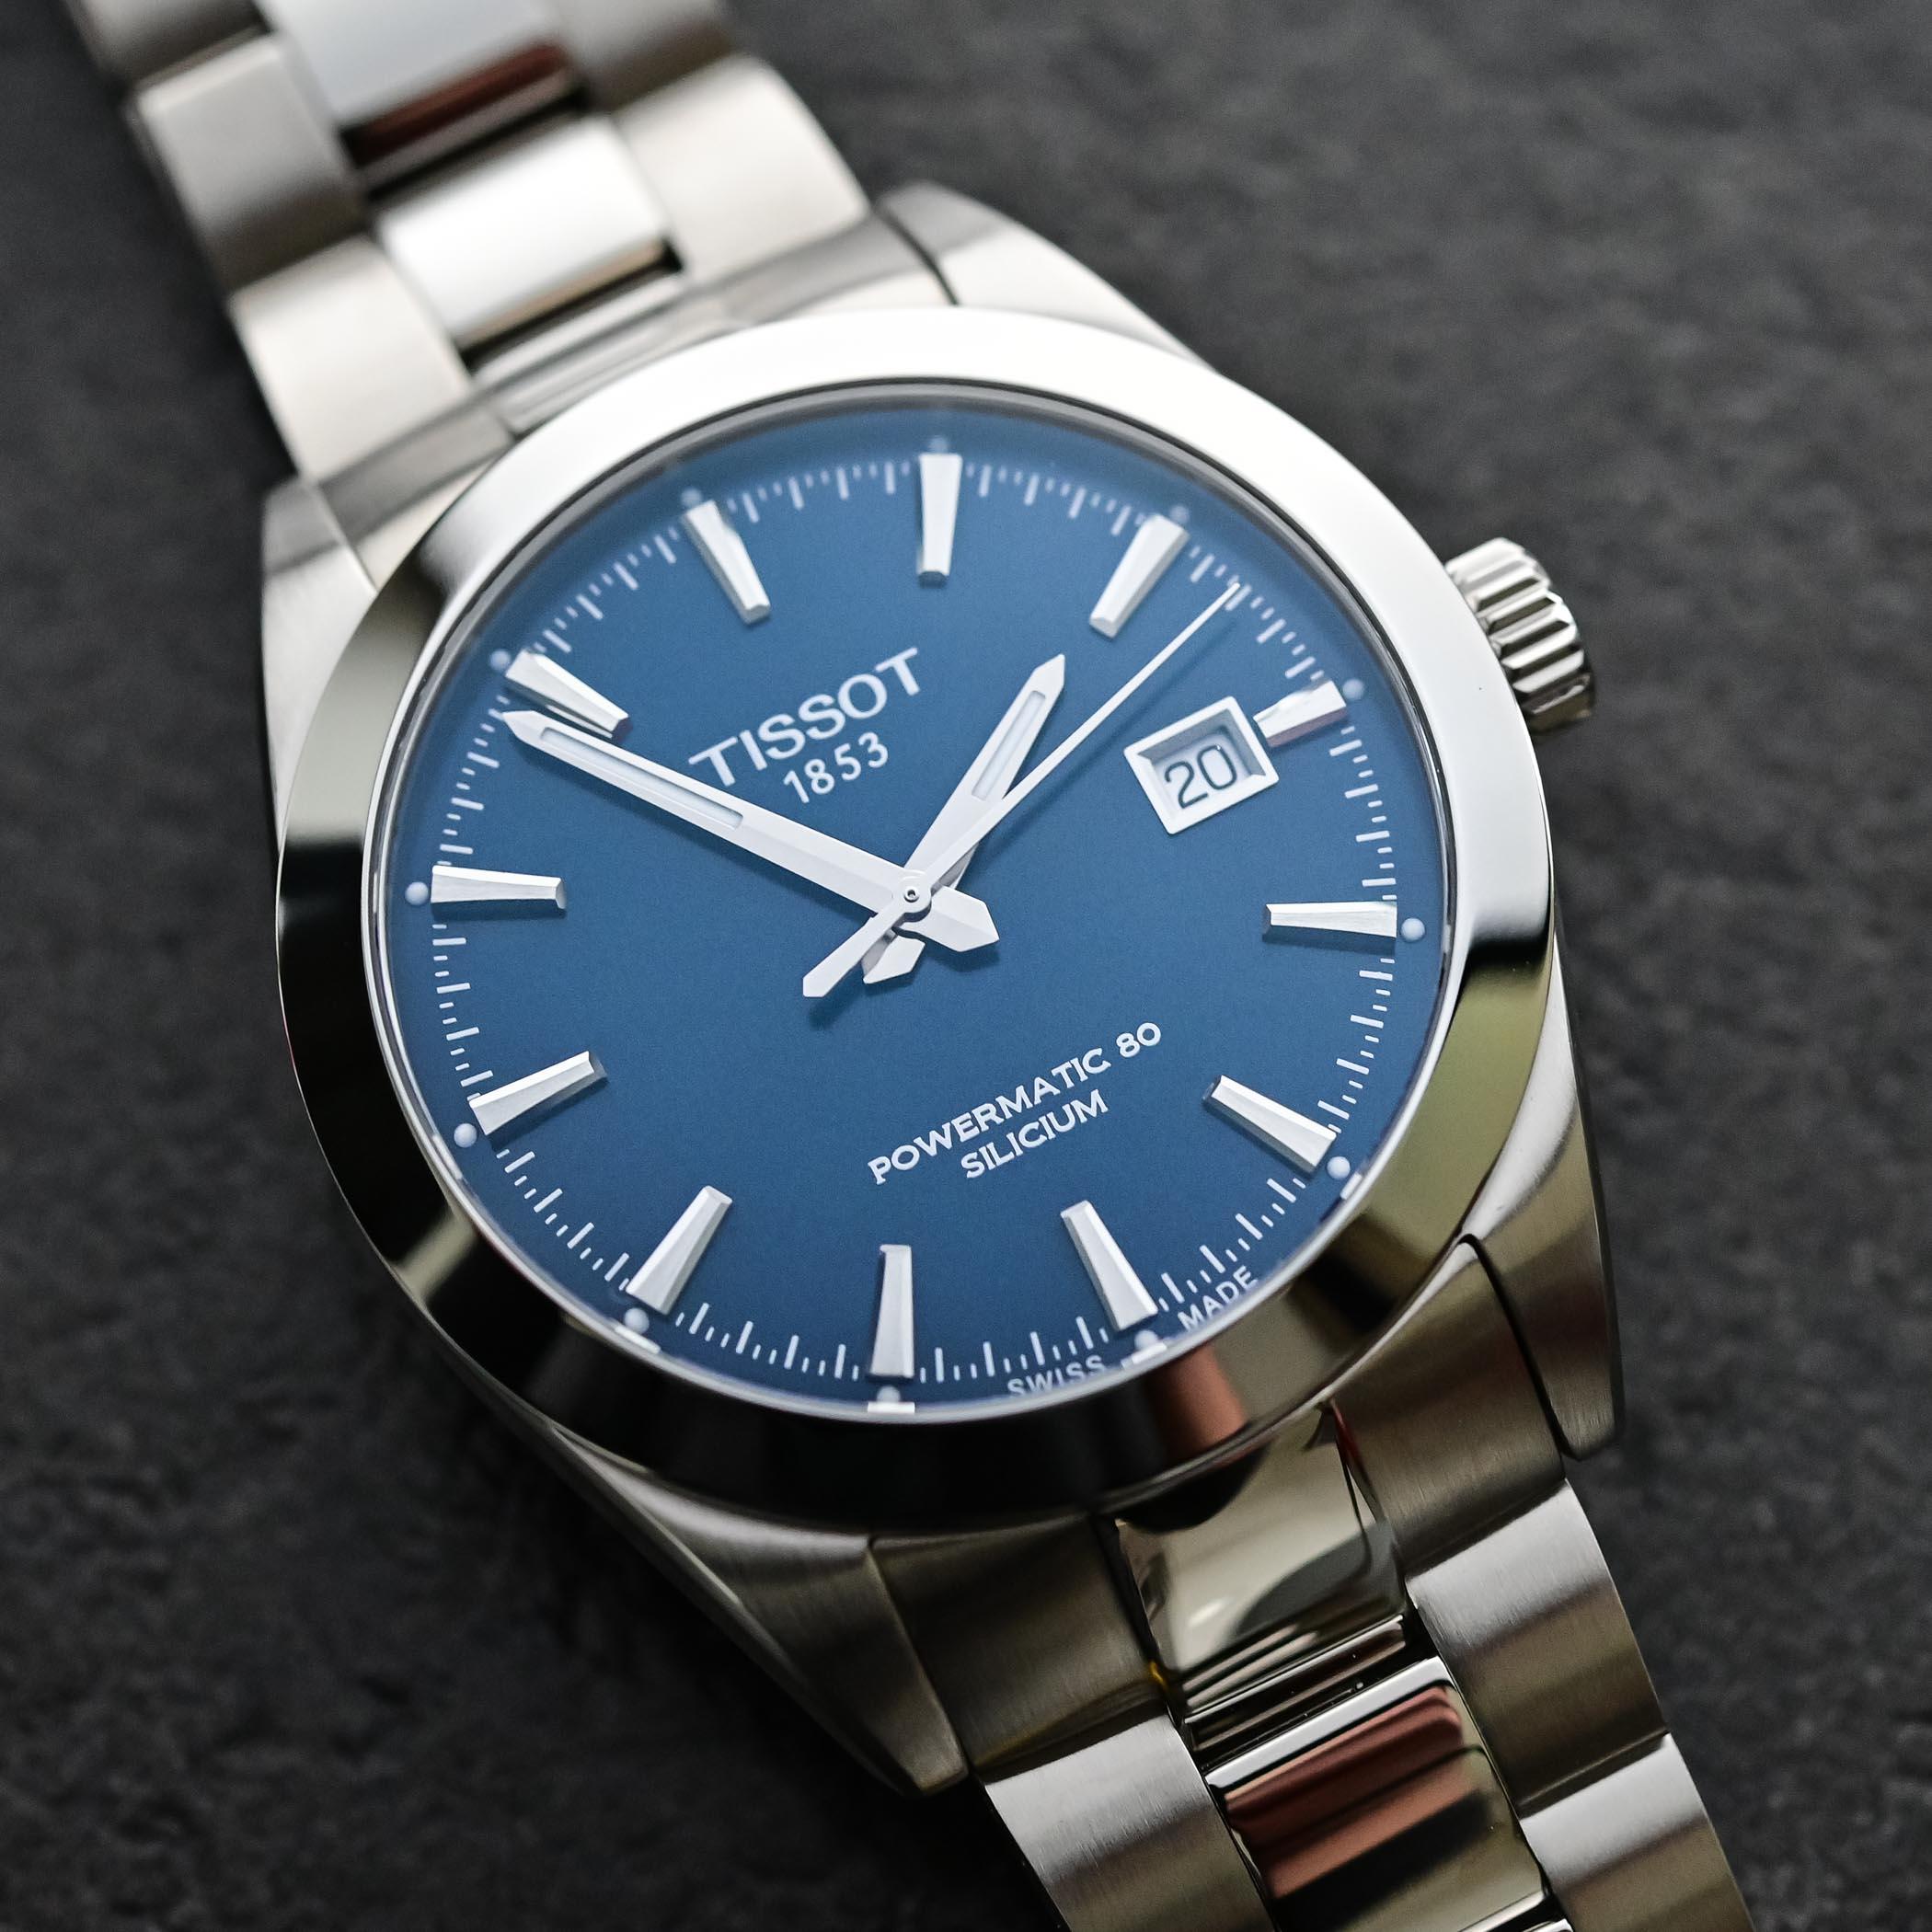 Tissot Gentleman Powermatic 80 Silicium Blue Dial